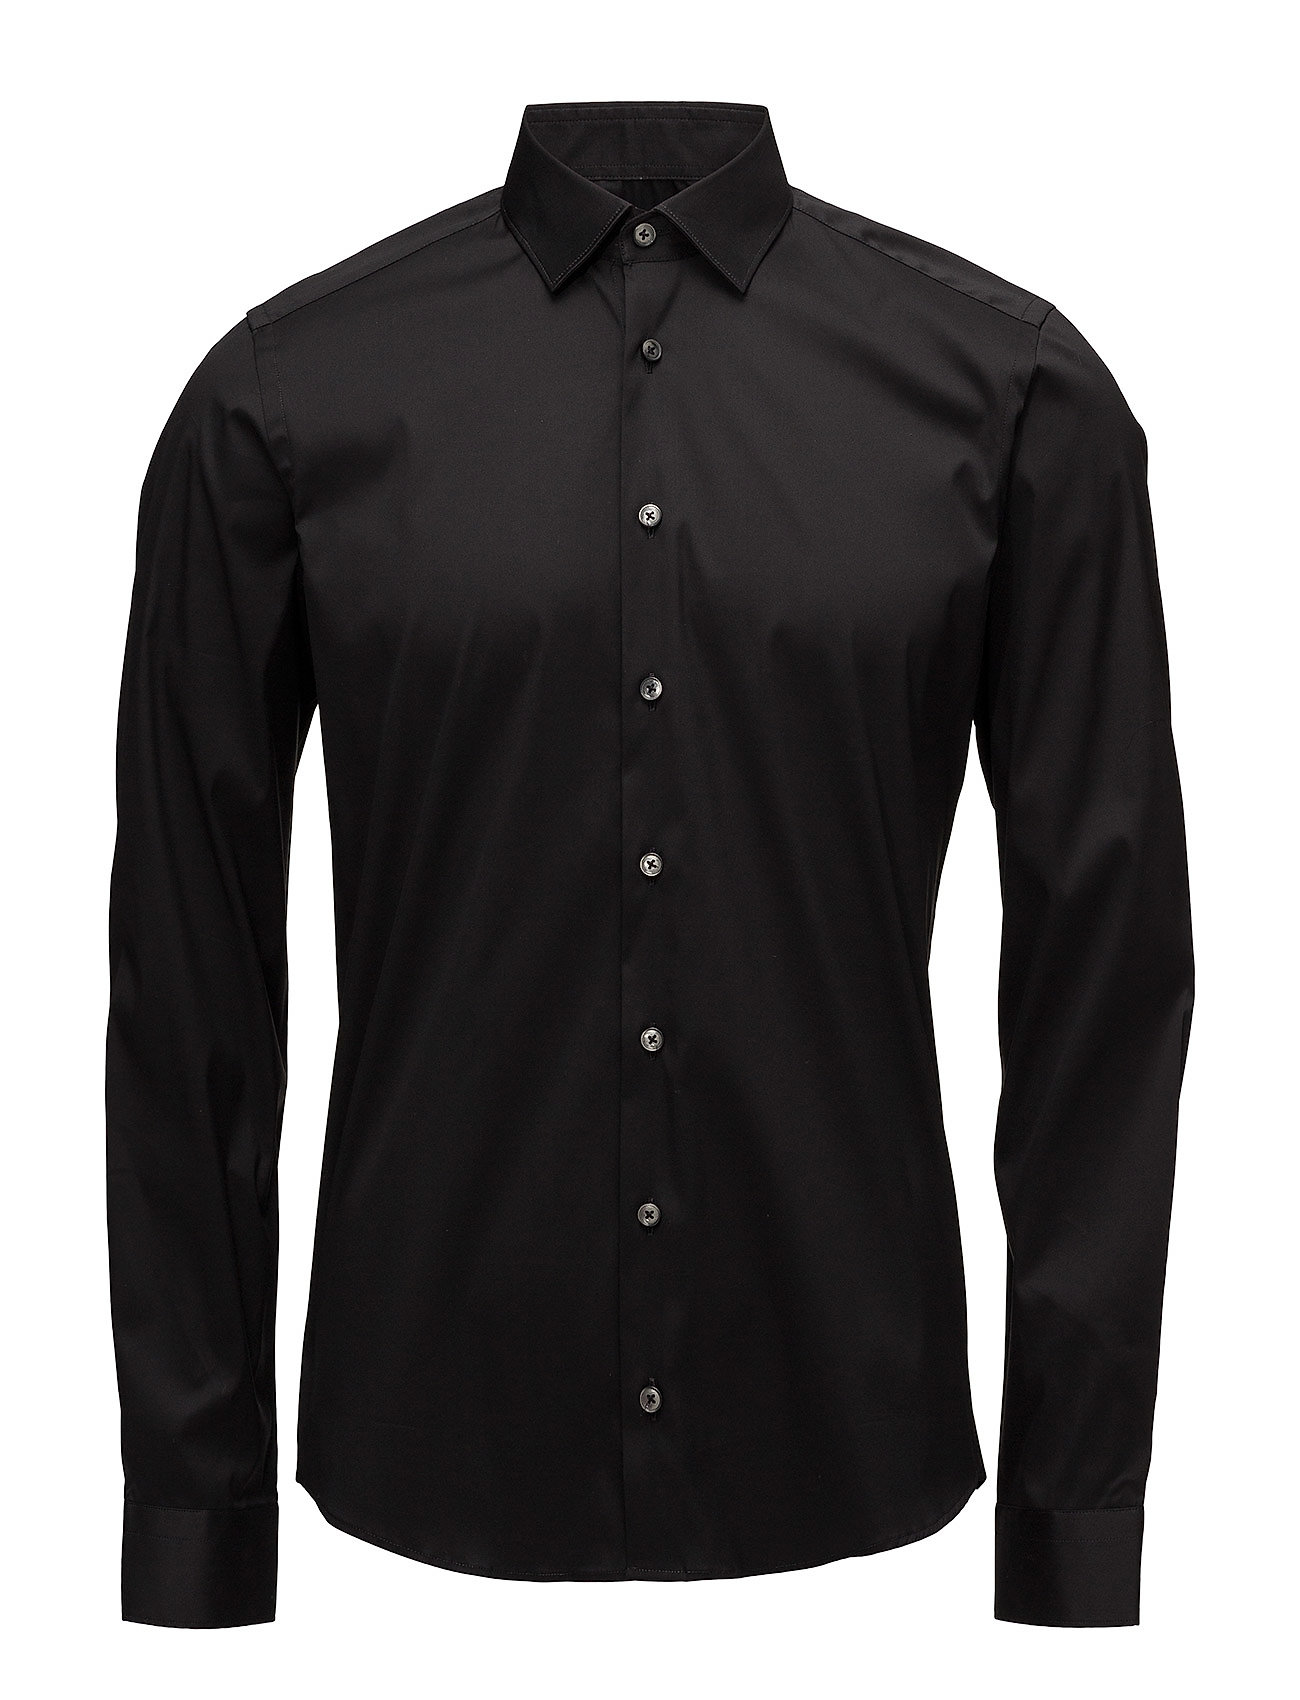 8261 - Bono (Black) (1049 kr) - SPO | Boozt.com